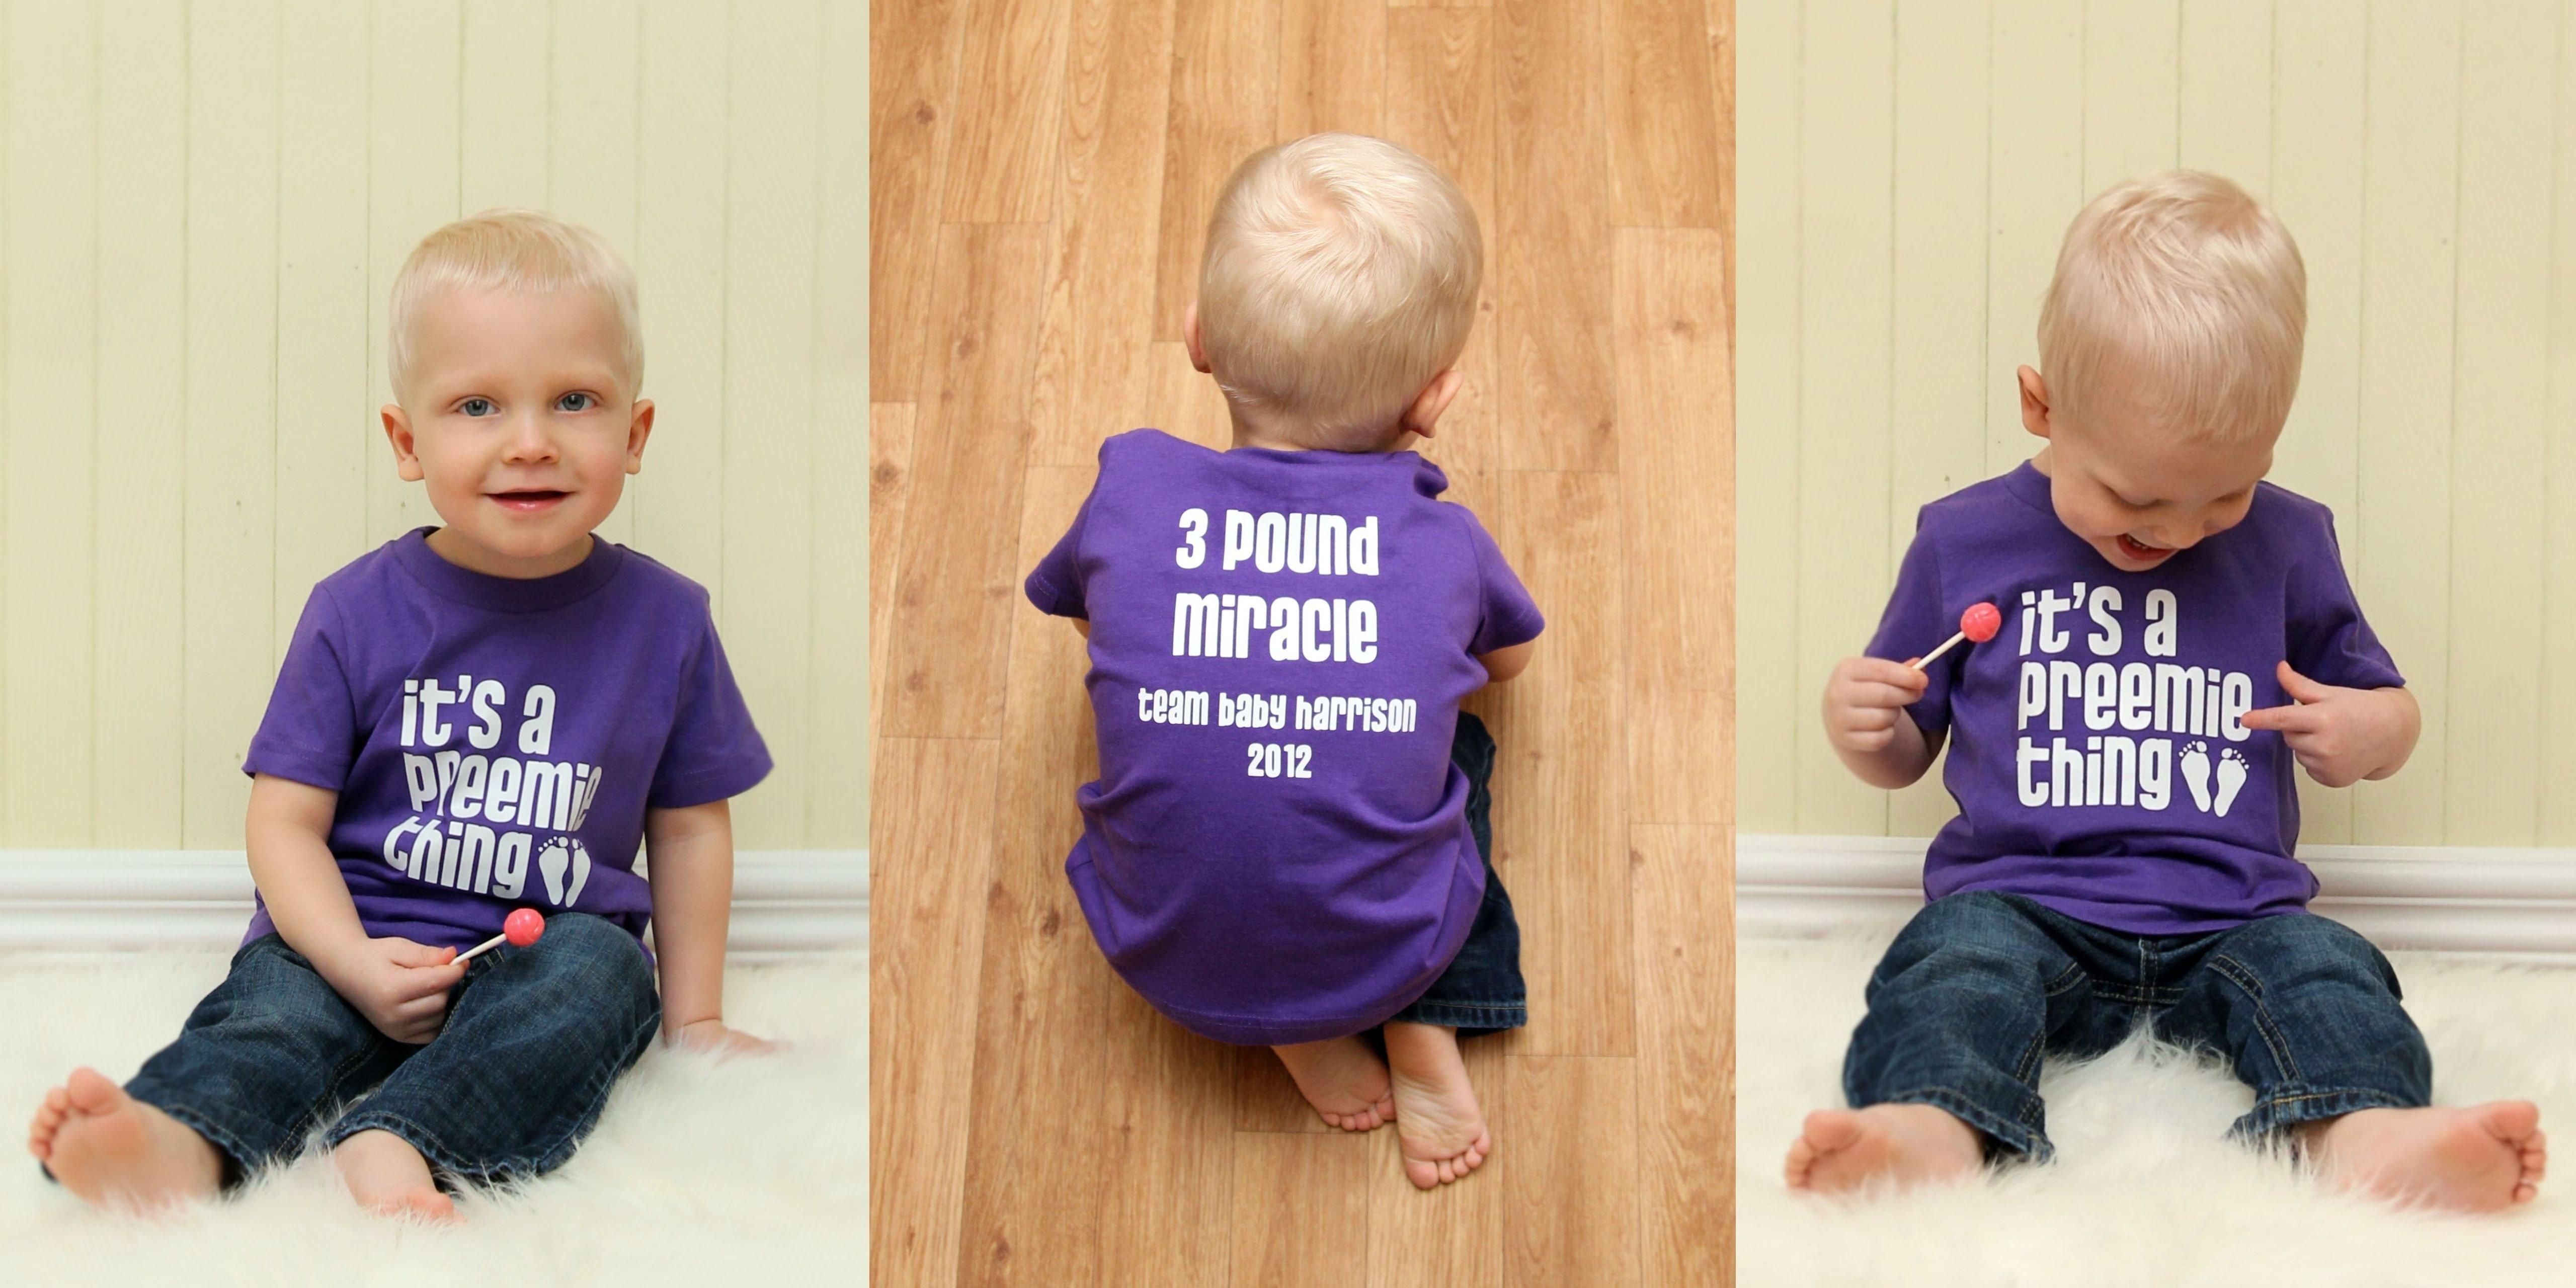 harrison born 11 weeks too soon, wearing one of my custom shirts